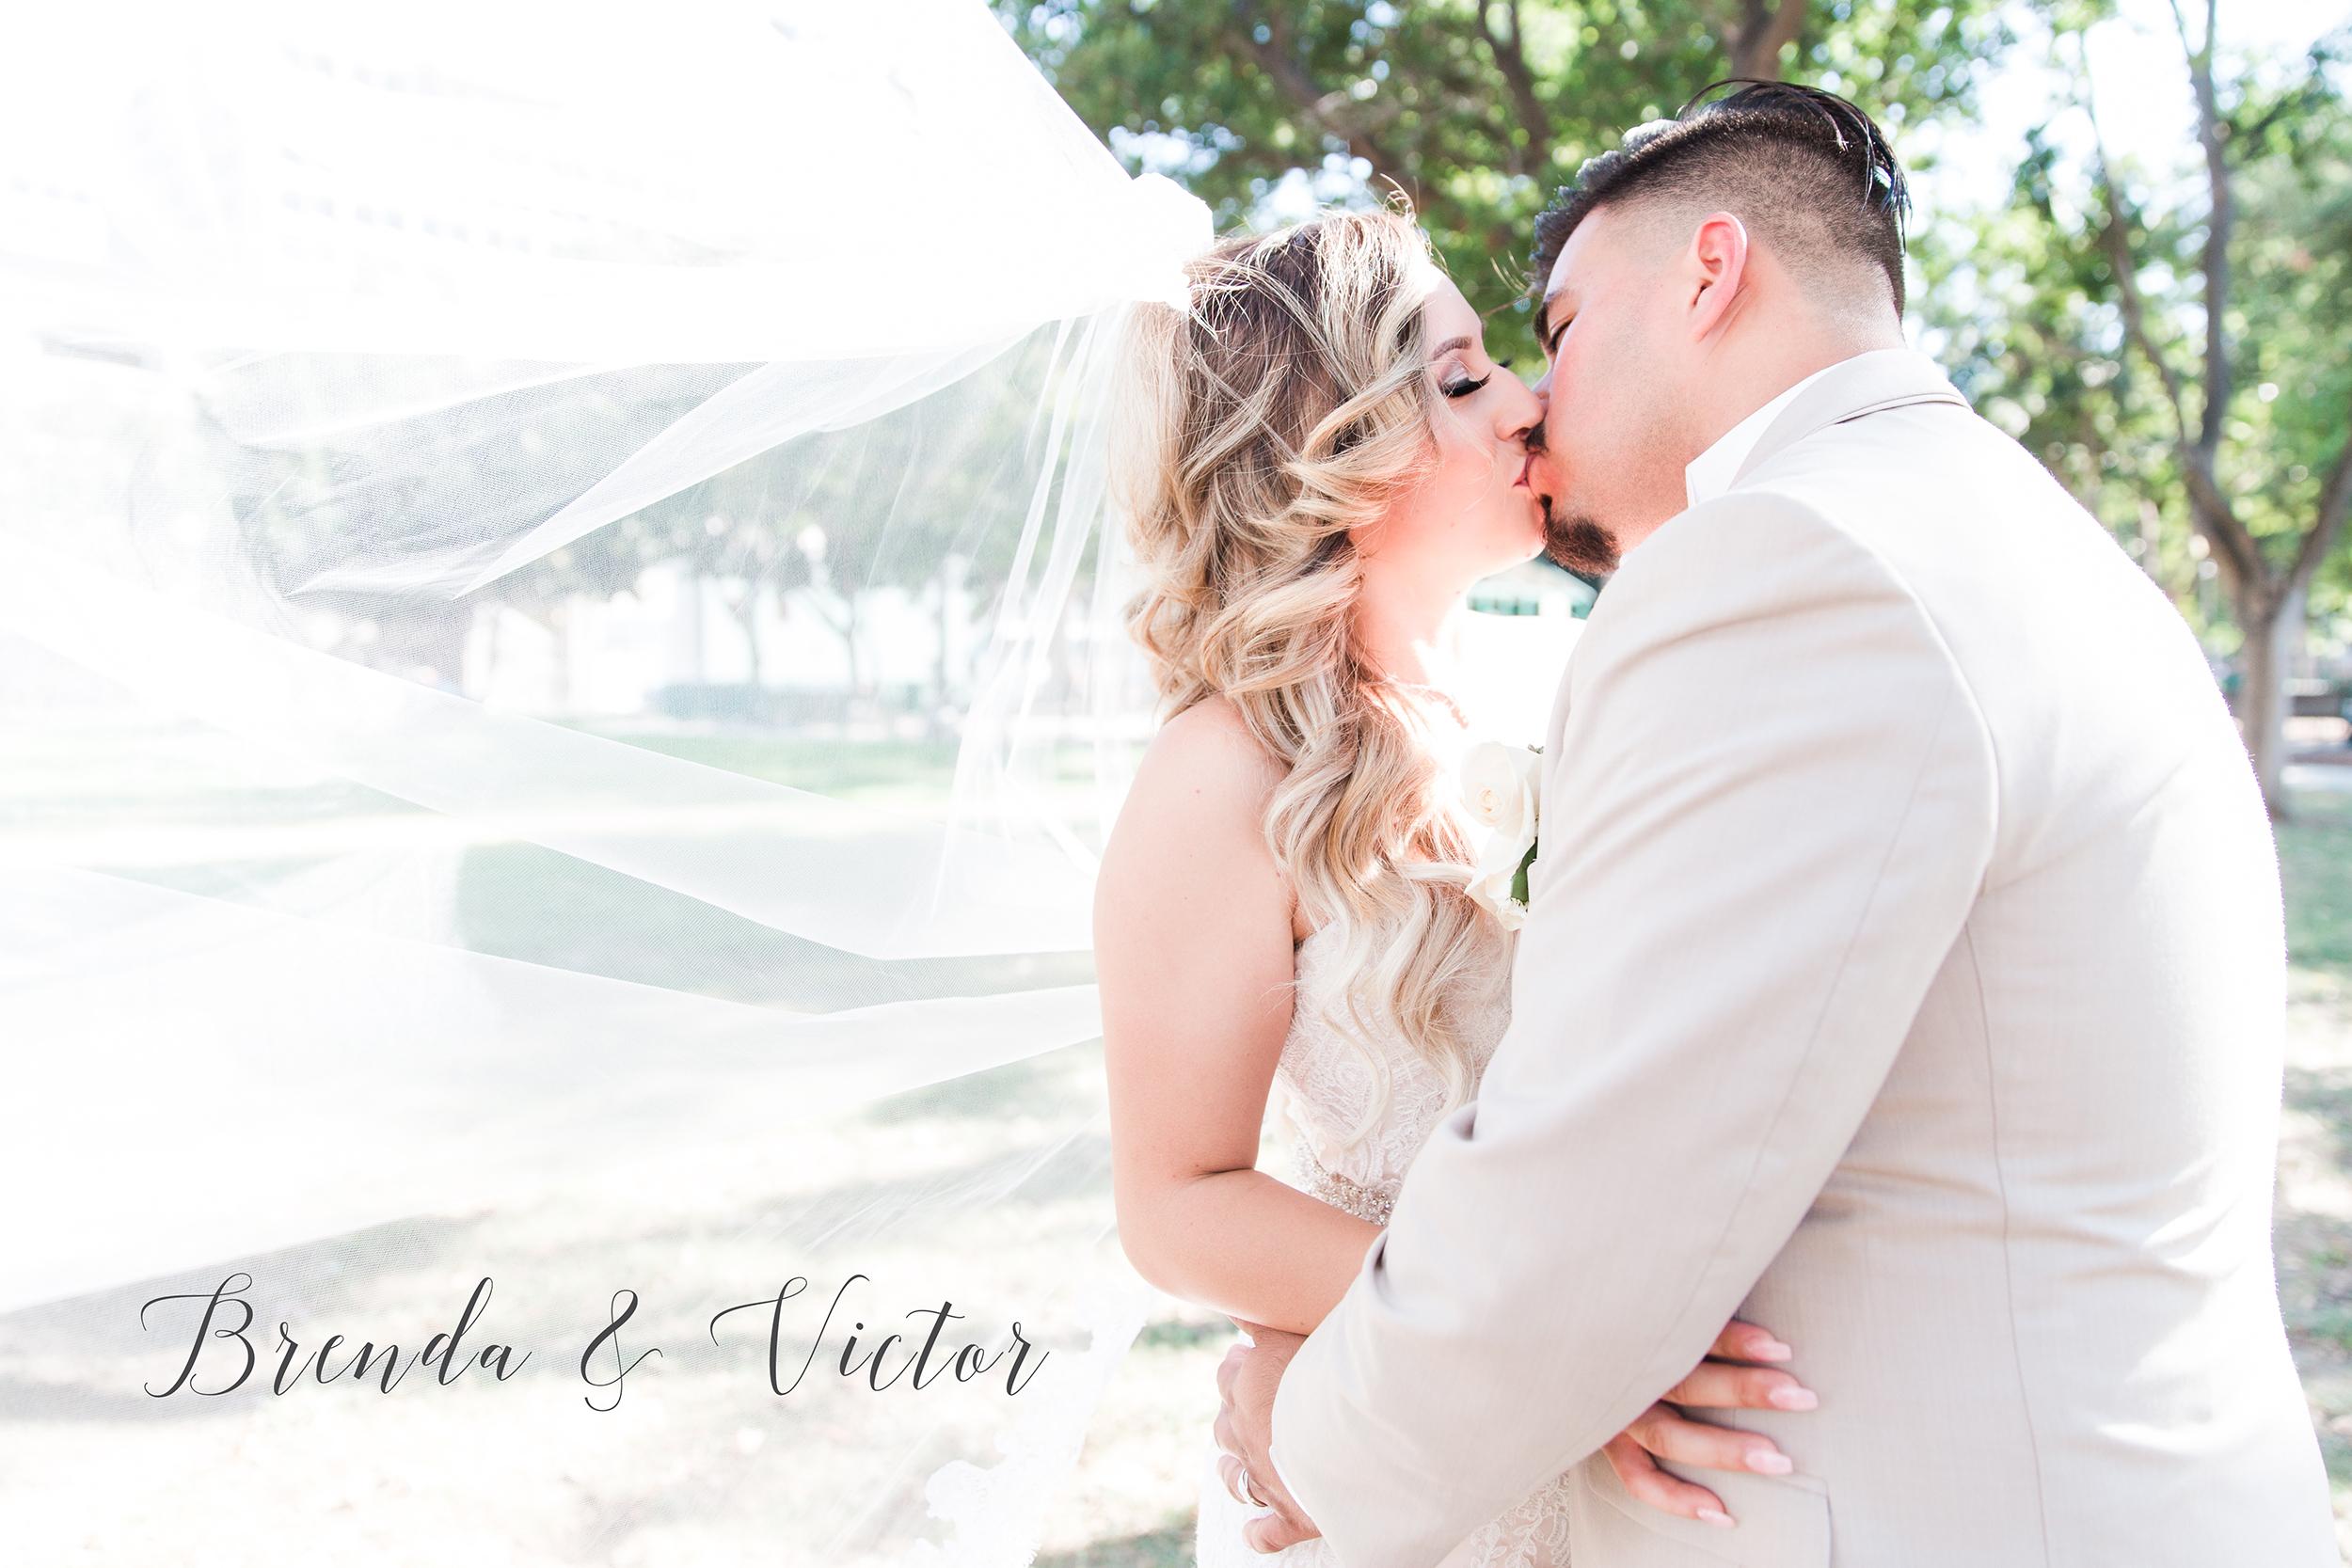 Downtown San Jose Corinthian Grand Ballroom wedding pictures by Briana Calderon Photography